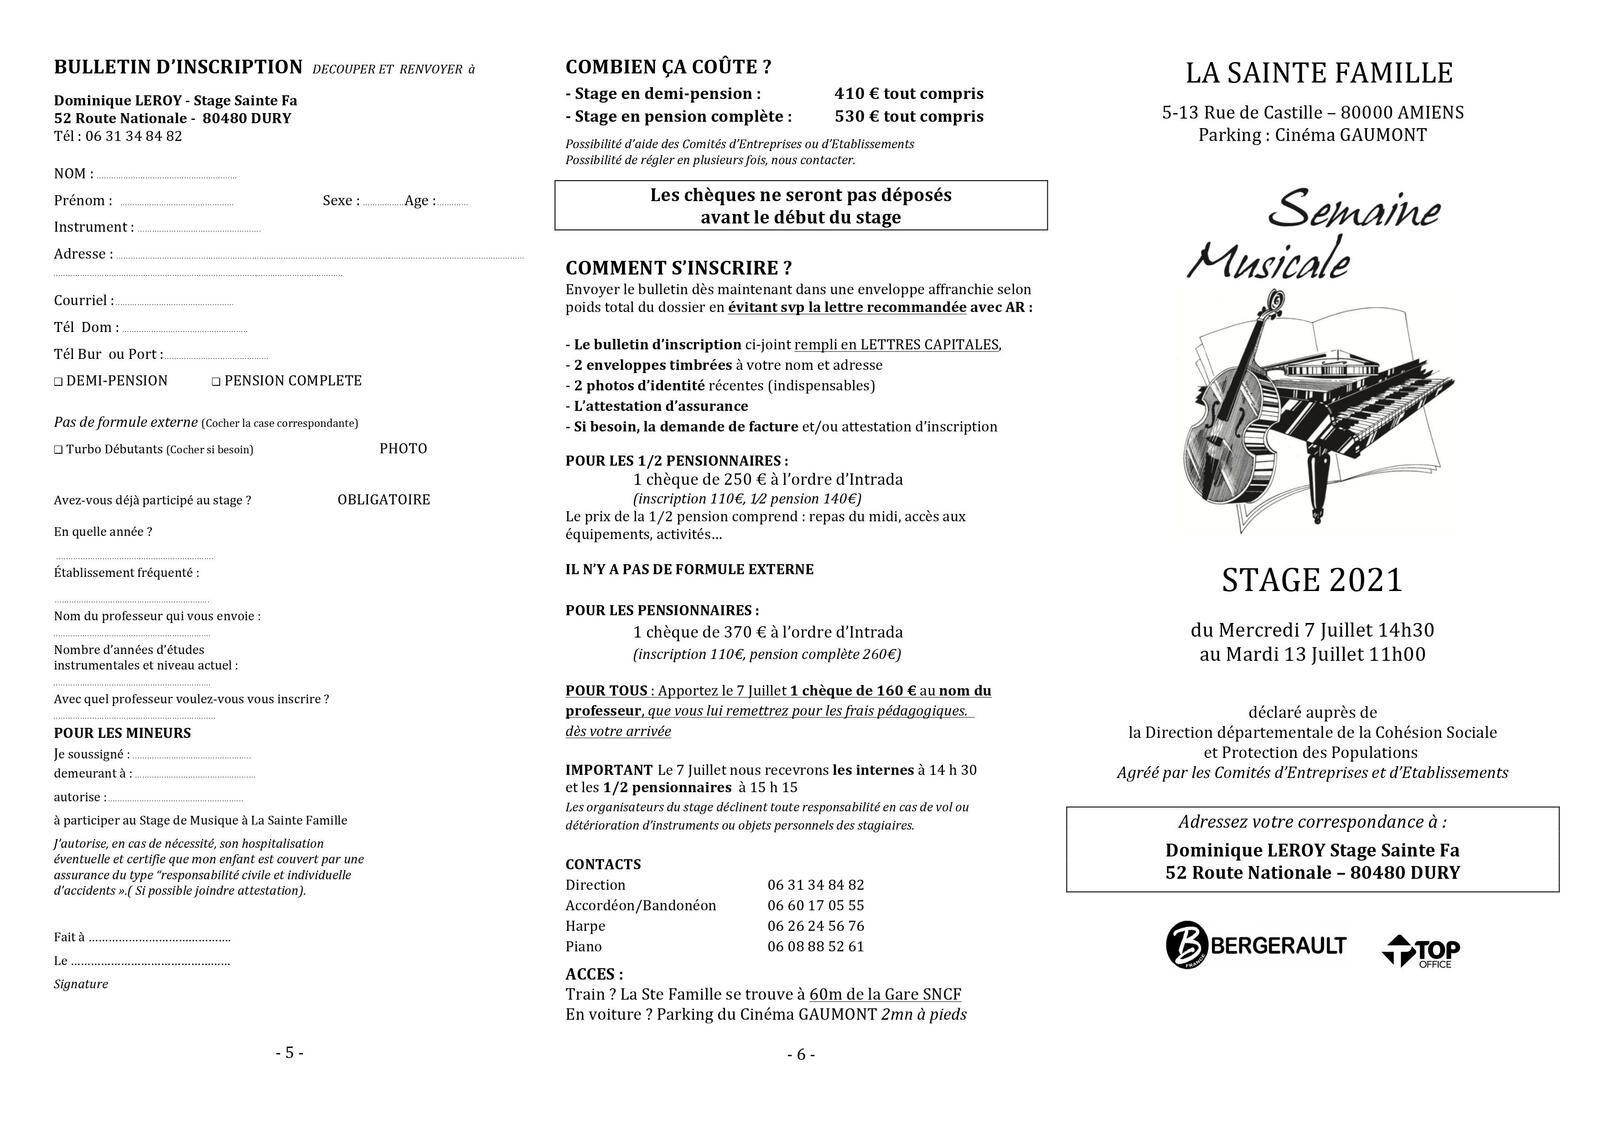 Une semaine musicale Stage 2021 à Amiens